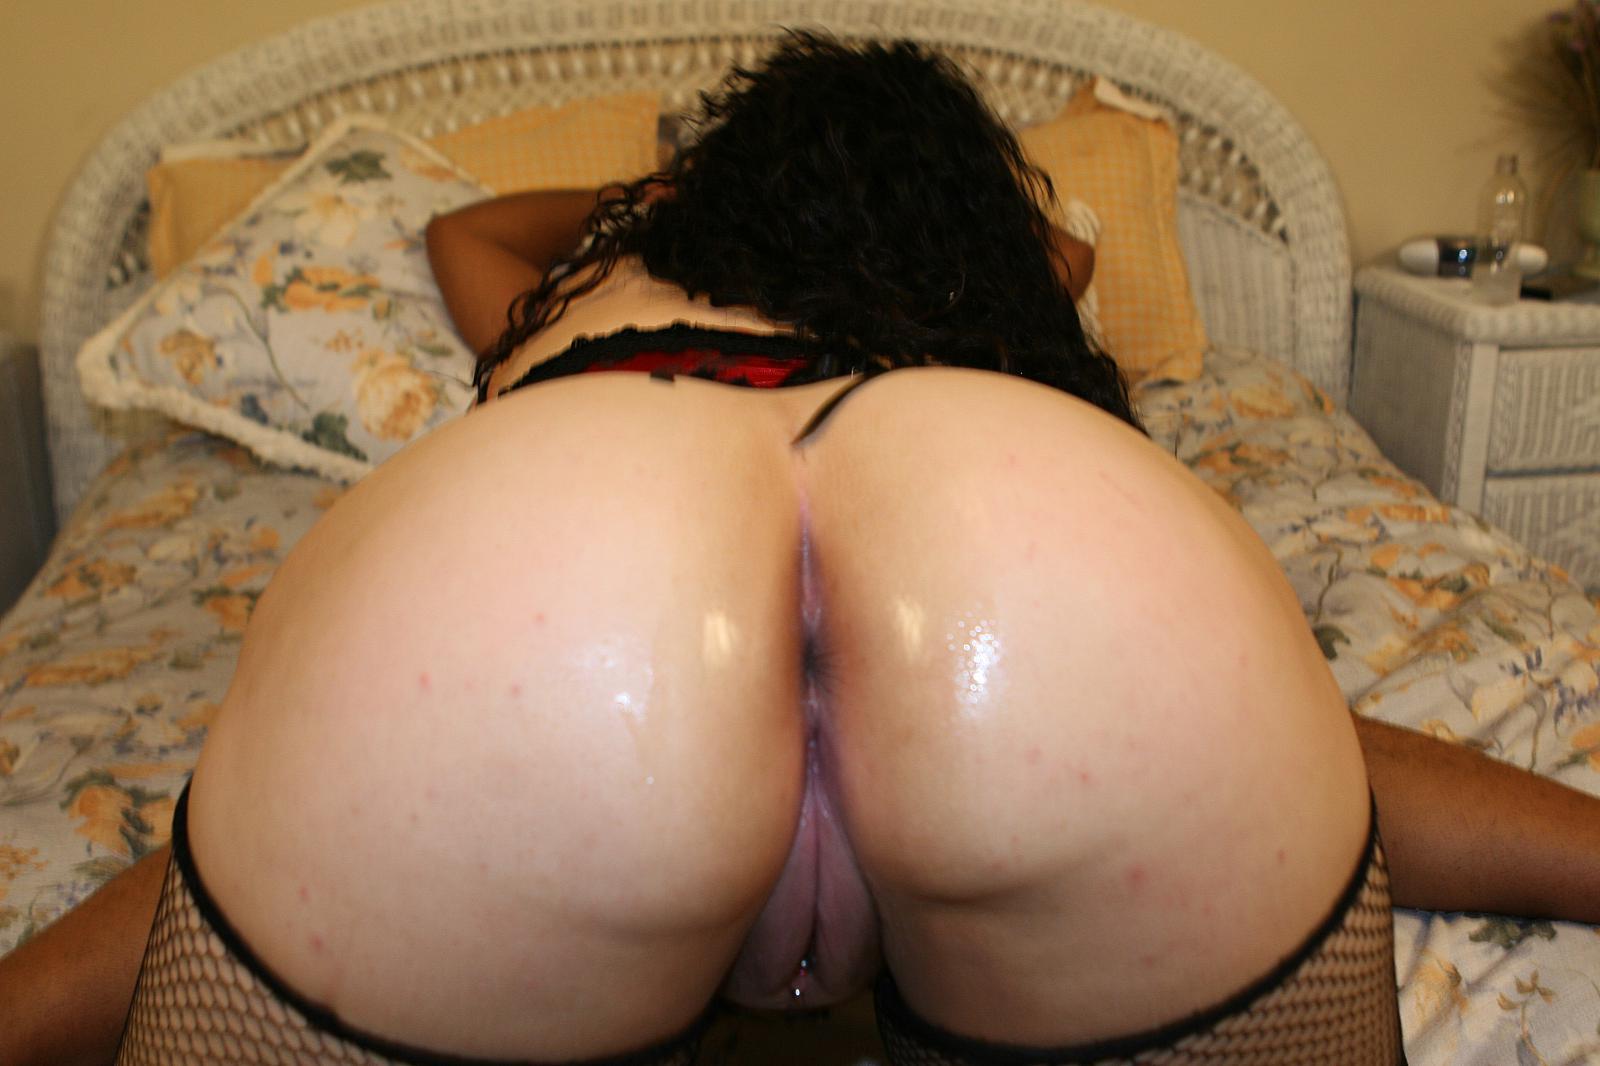 Bbw rides and cumshot top porn images